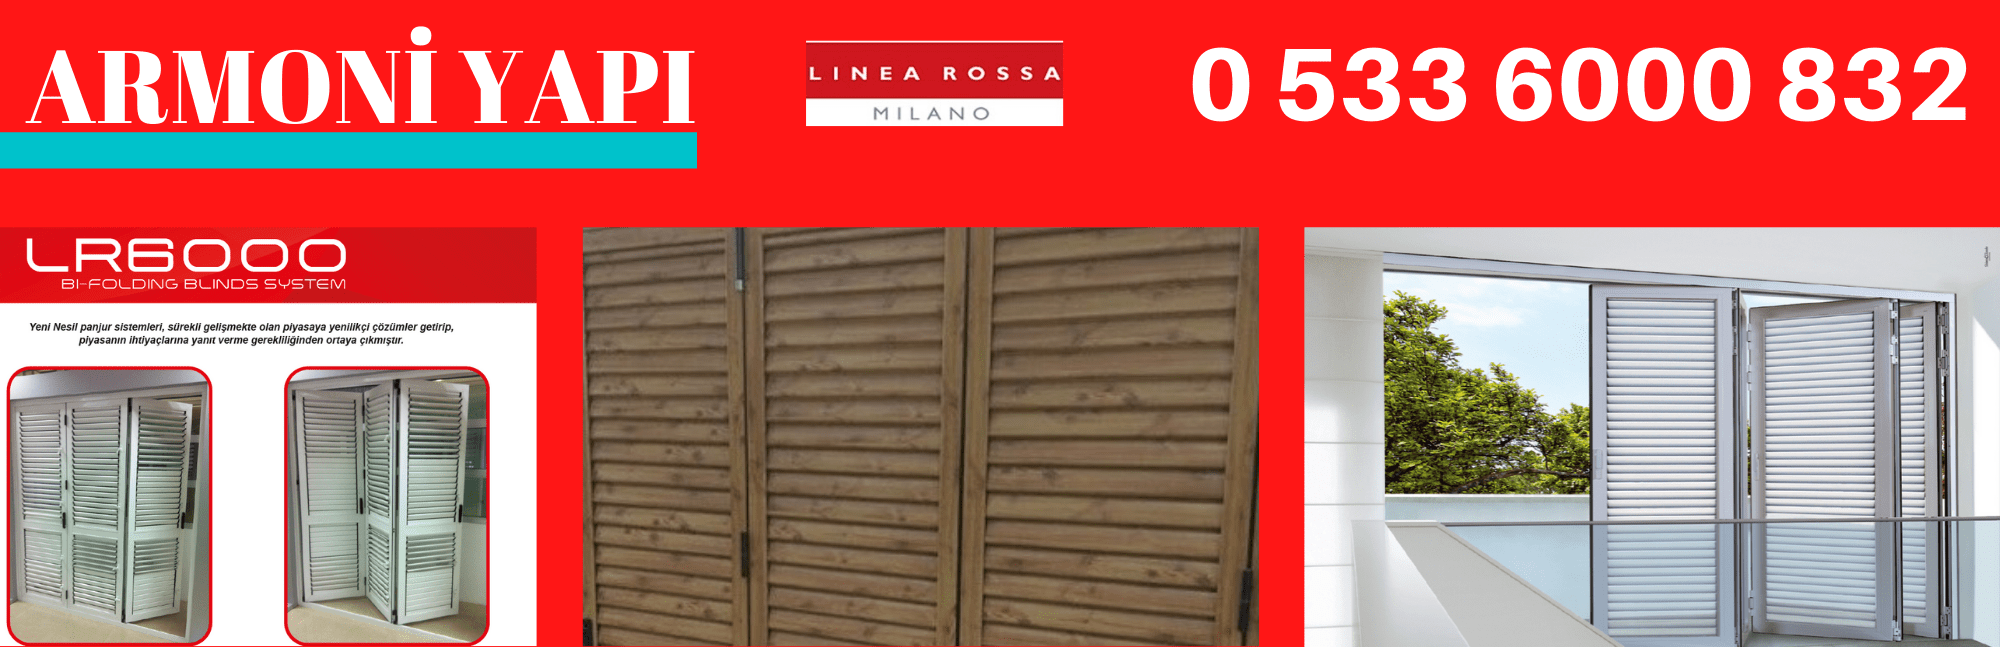 Linea Rossa LR-6000 alüminyum kepenk